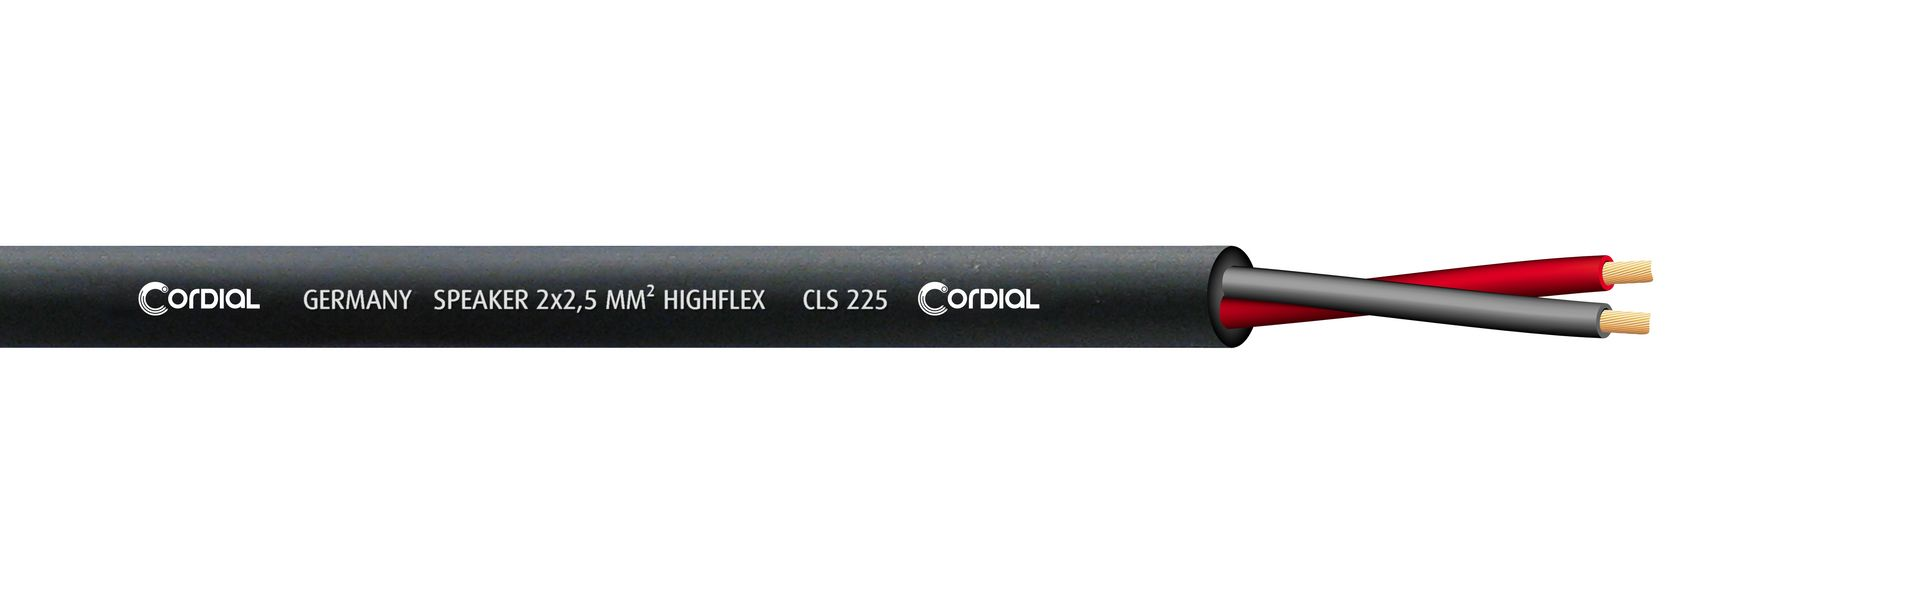 Cordial CLS 225 BK Lautsprecherkabel schwarz 2 x 2,50 qmm, Meterware Highflex